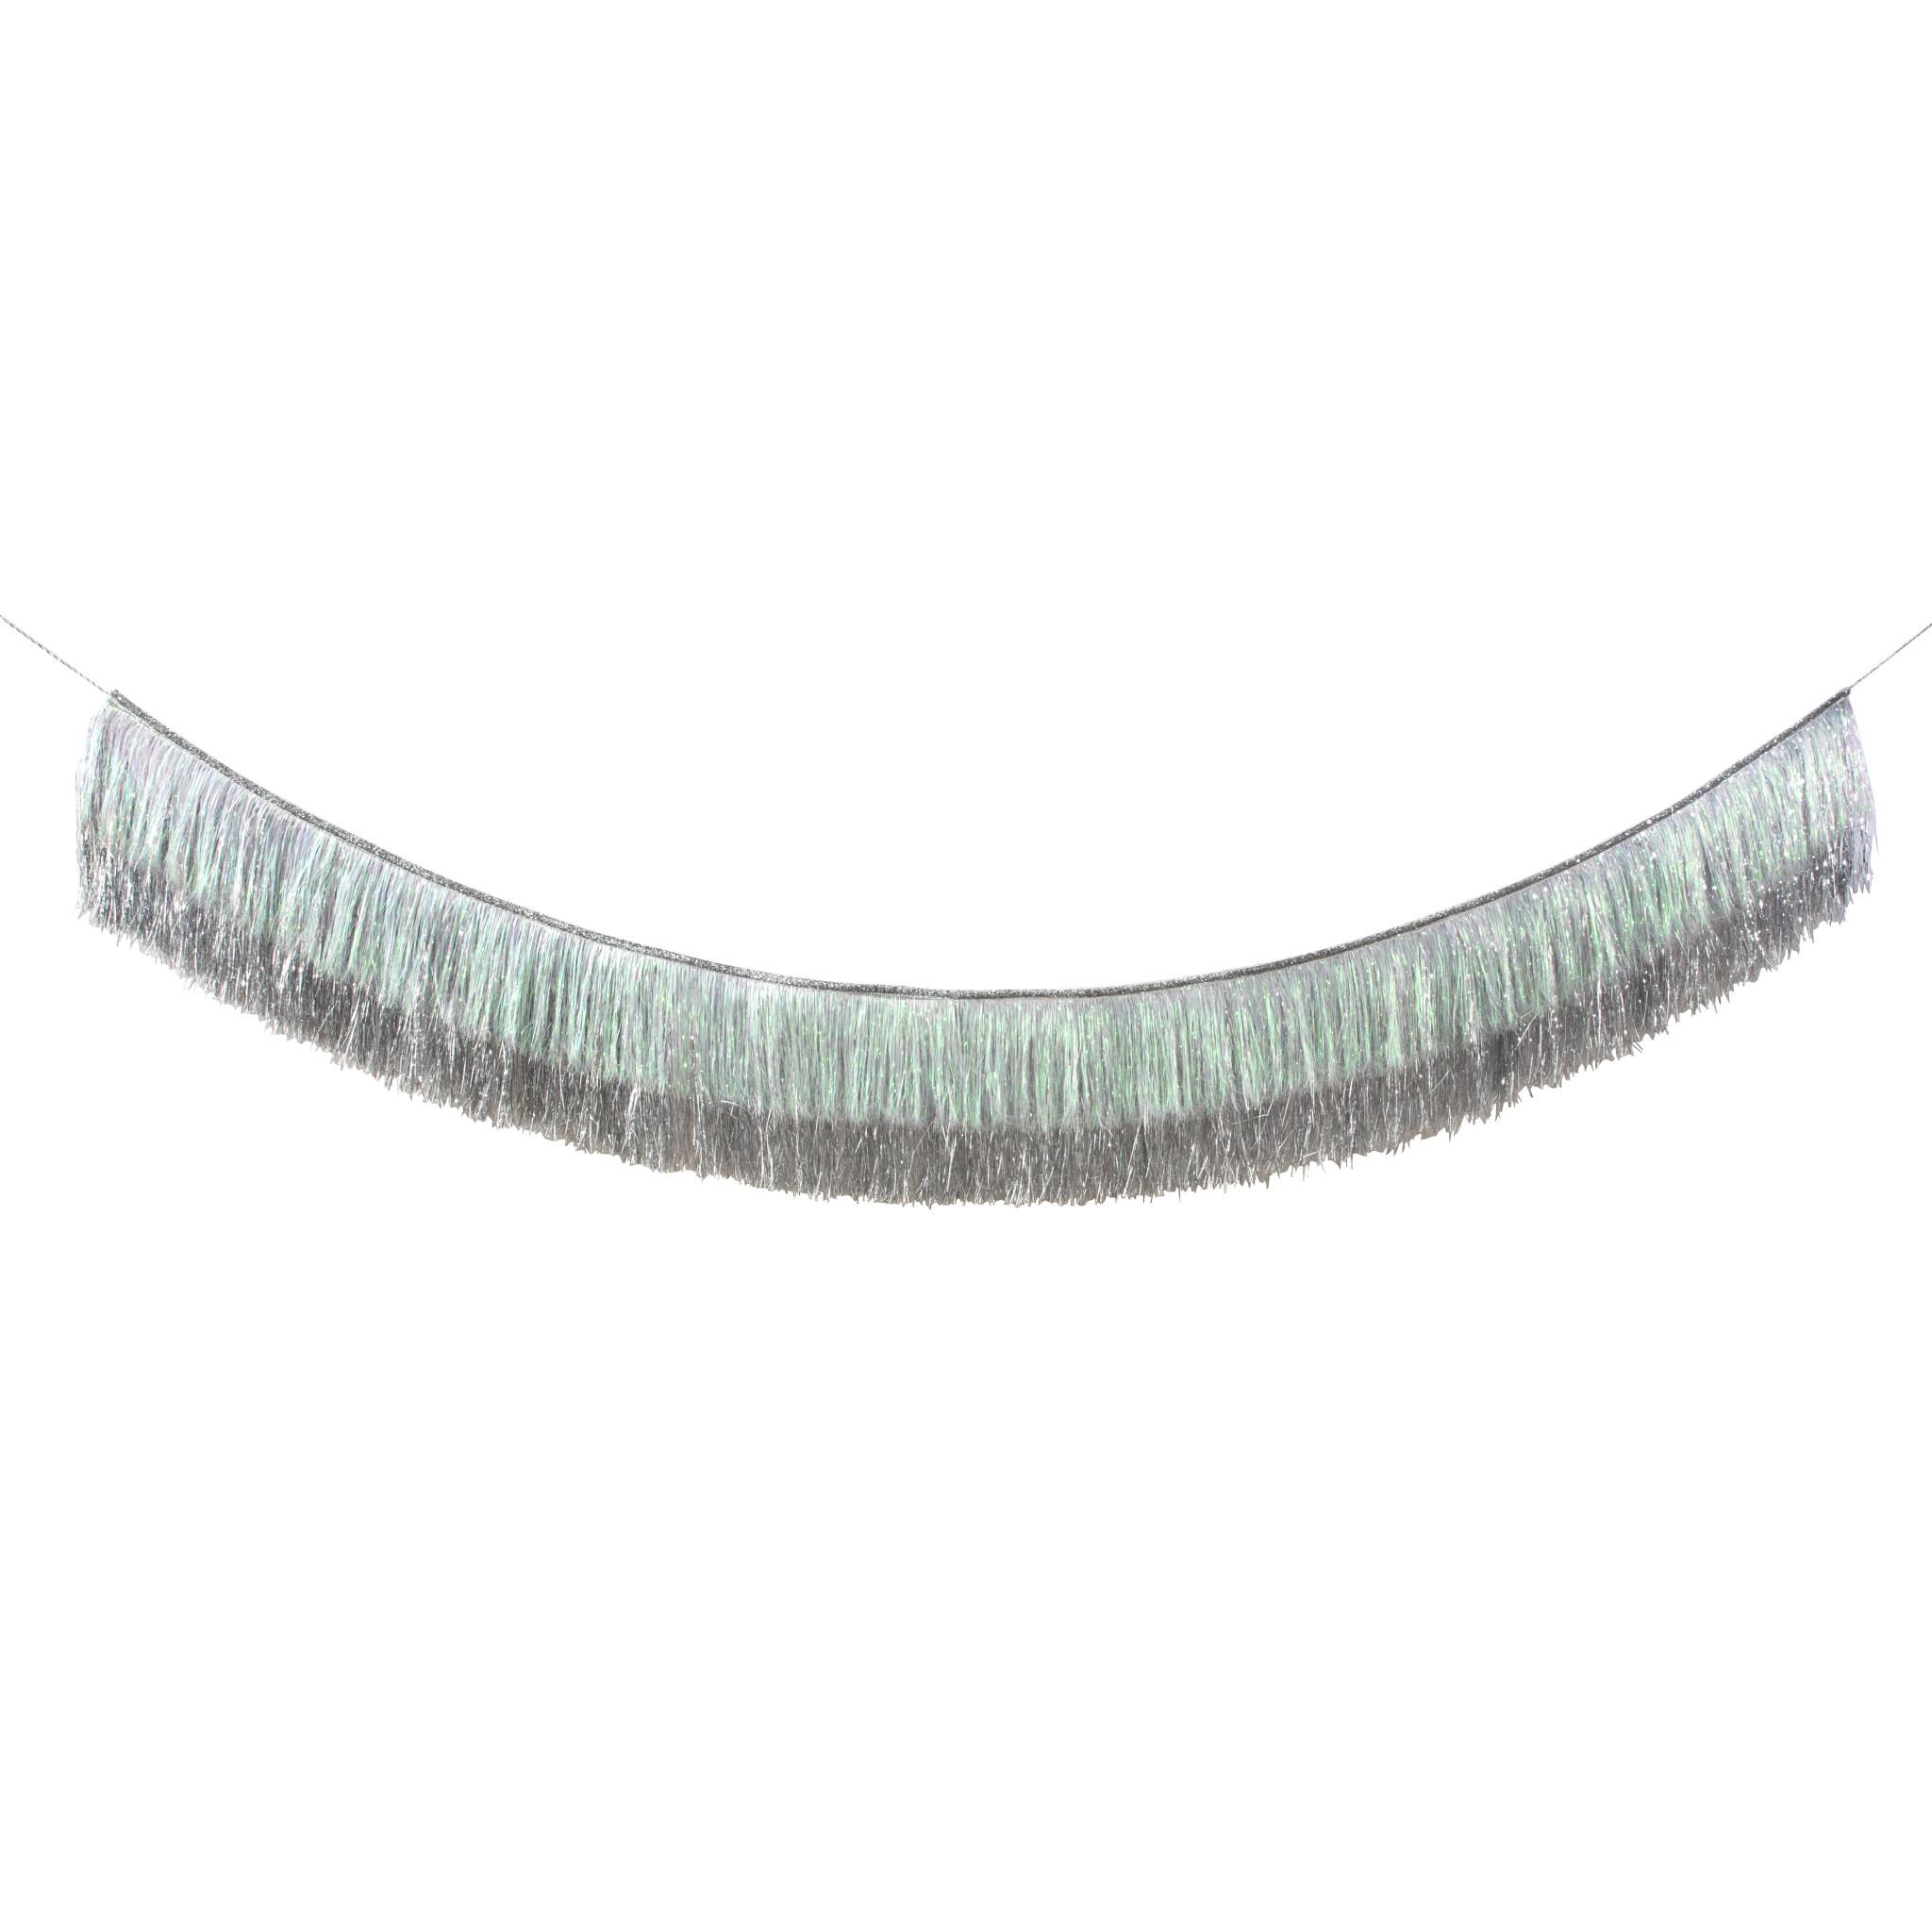 MERIMERI Tinsel silver garland